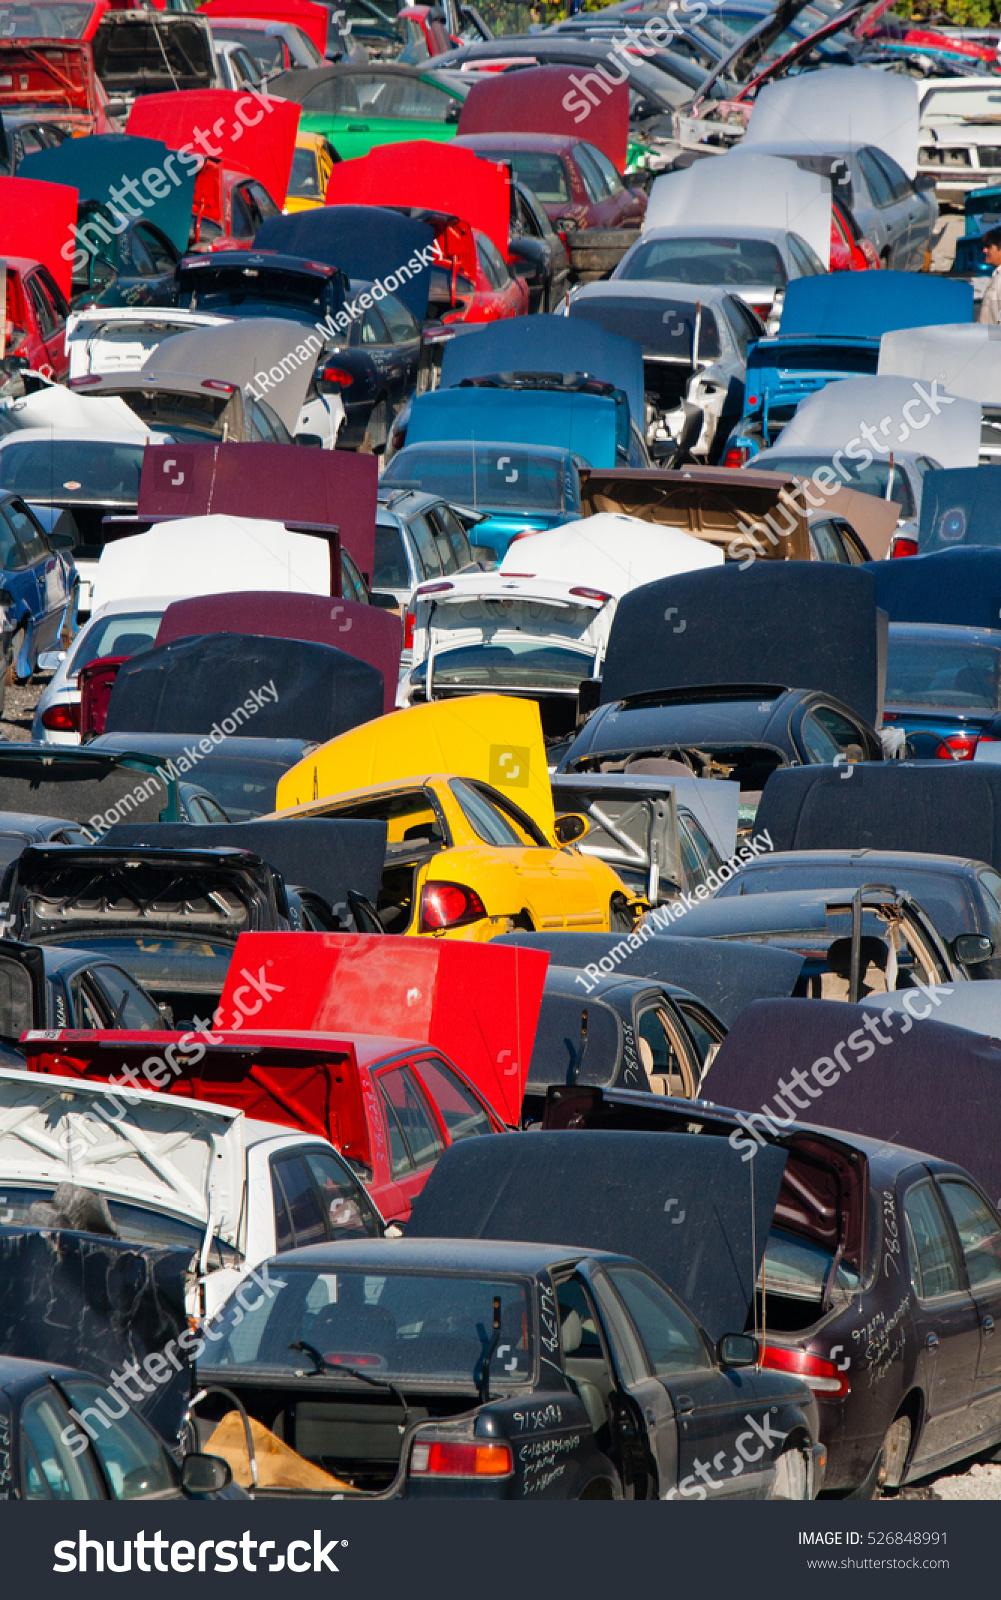 Scrap Car Recycle Yard Stock Photo 526848991 - Shutterstock